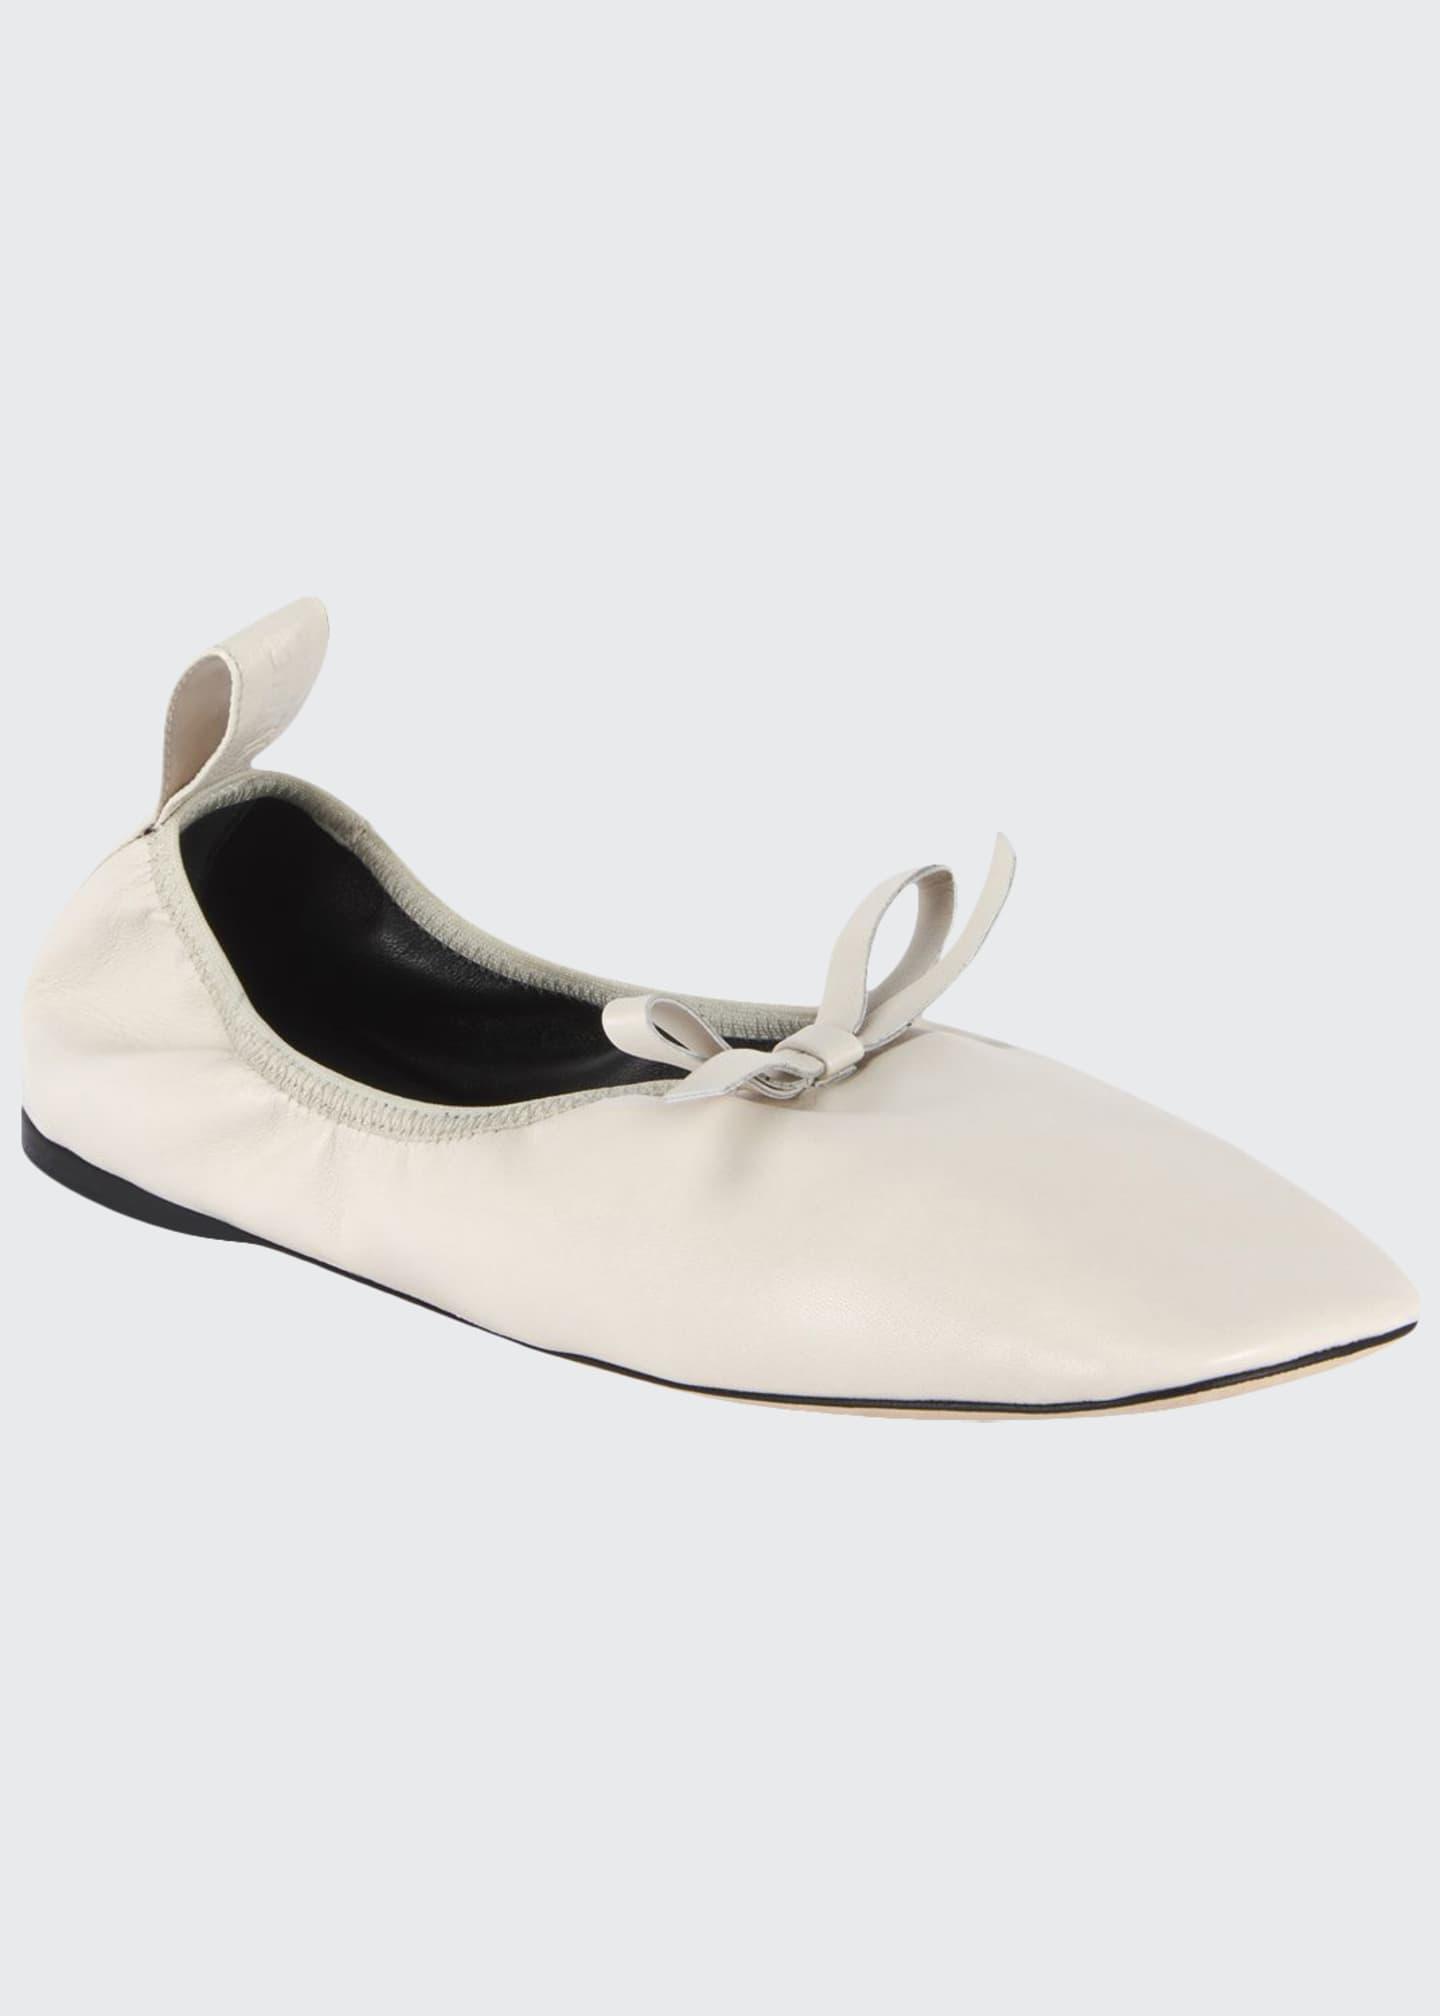 Loewe Soft Napa Bow Ballet Flats, White